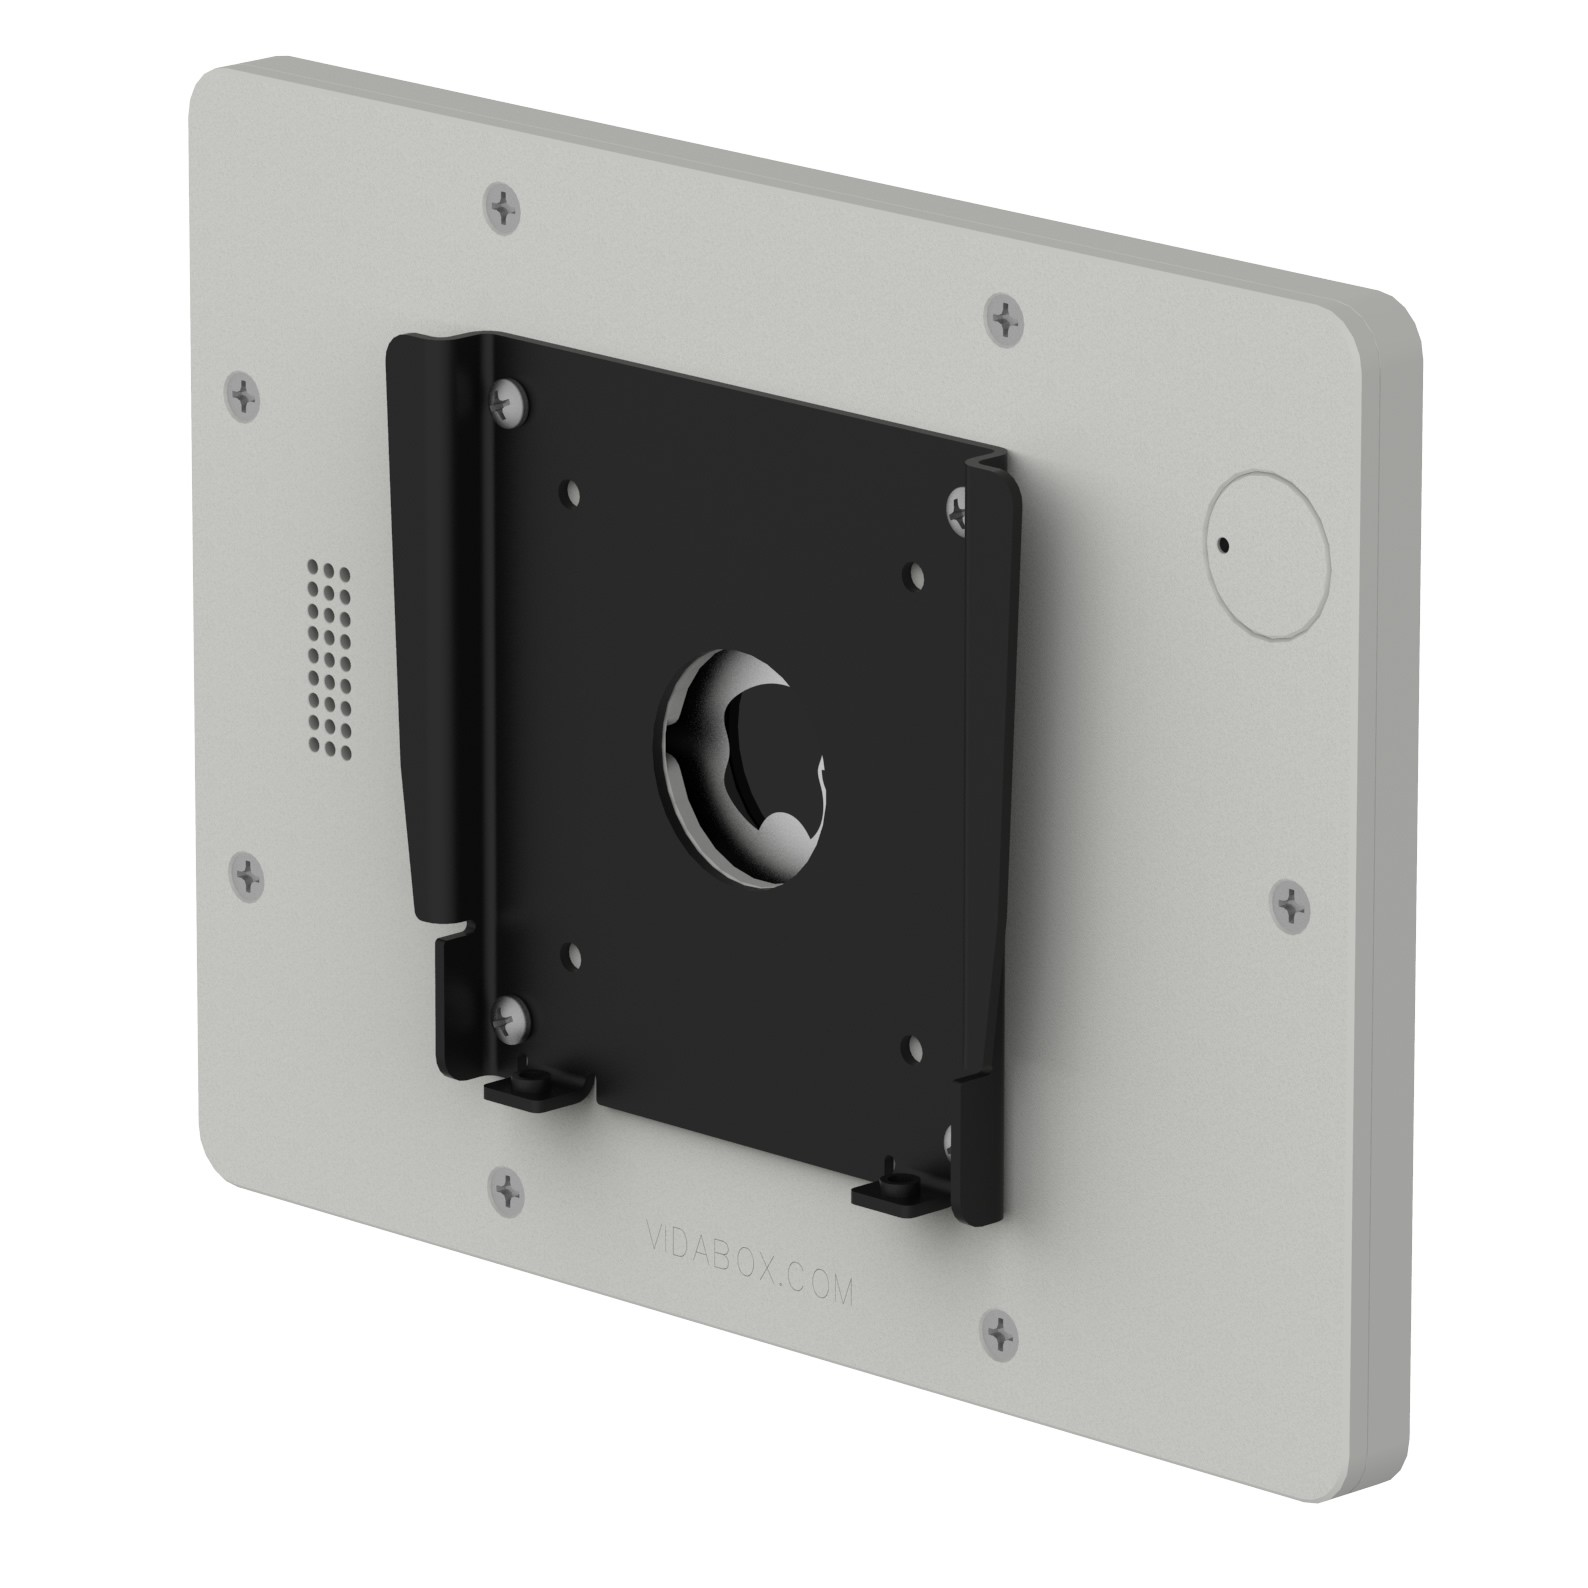 fixed slim vesa wall mount ipad mini 4 light grey back isometric view - Tablet Mount